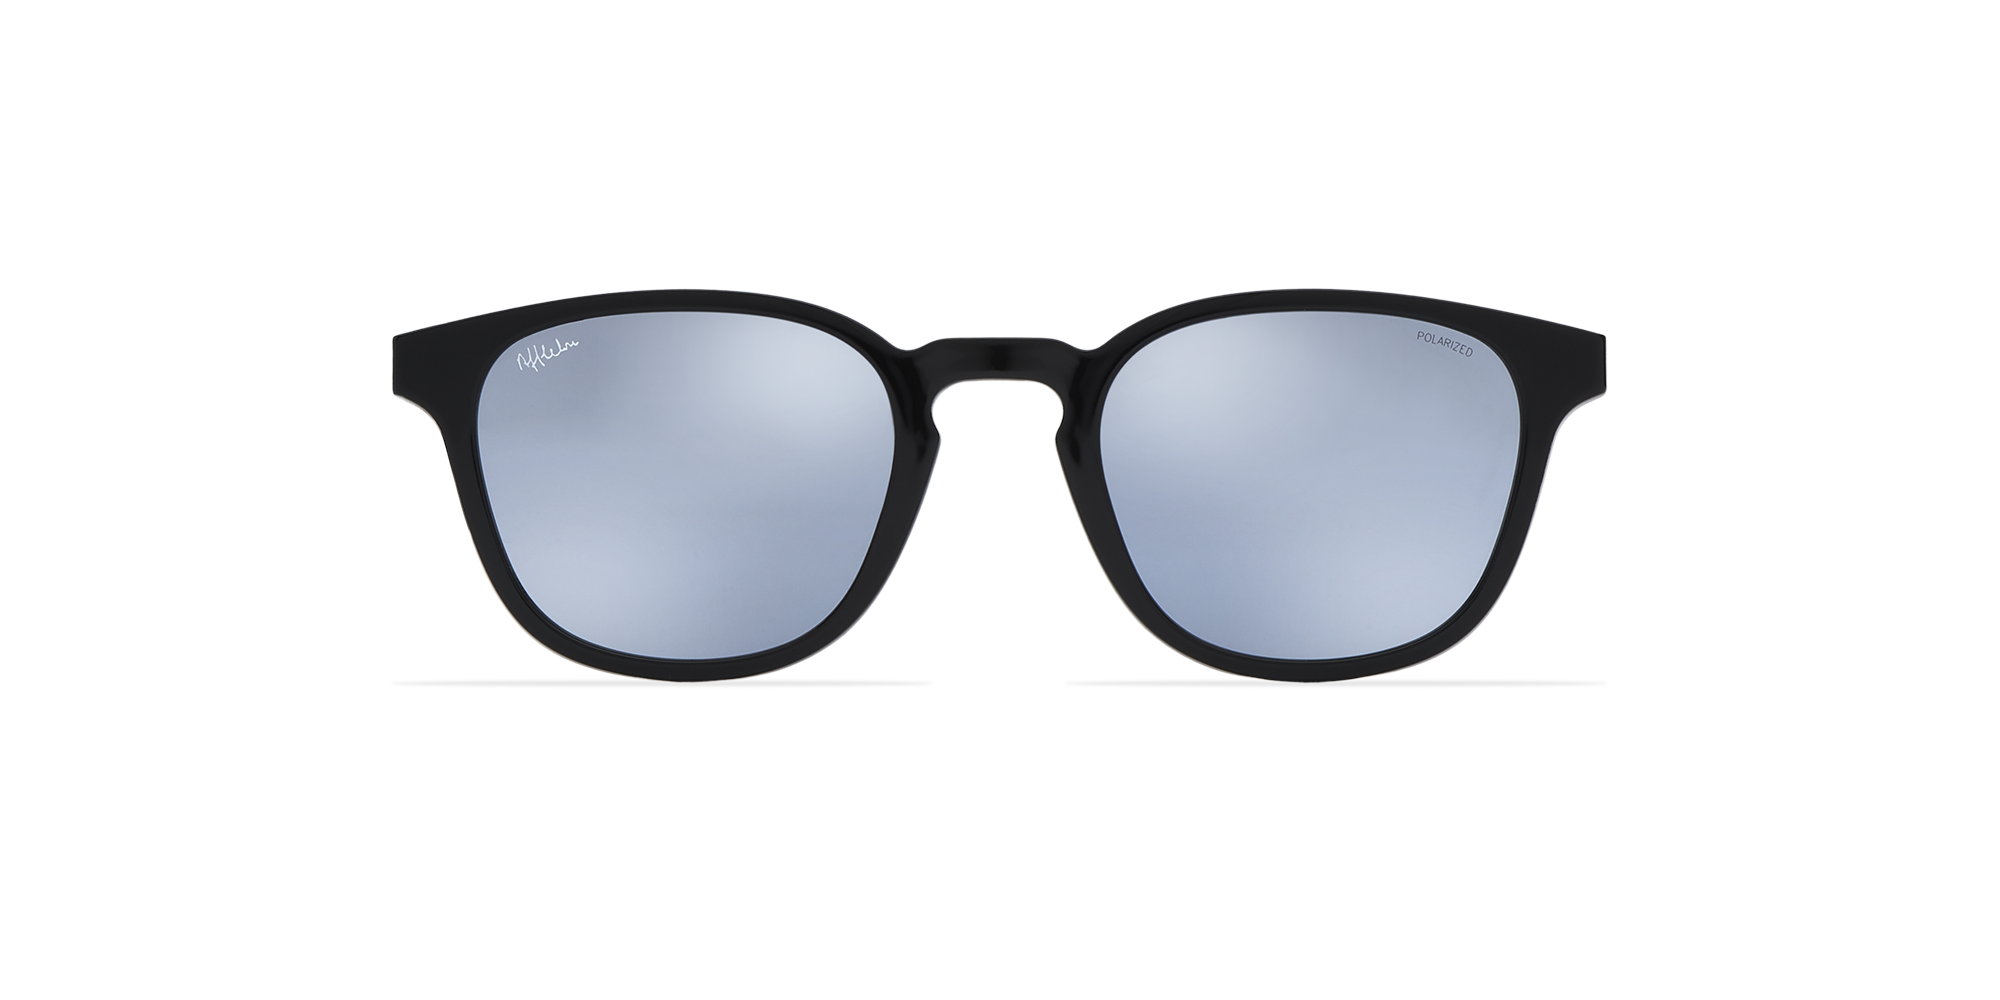 afflelou/france/products/smart_clip/clips_glasses/07630036429167_face.png